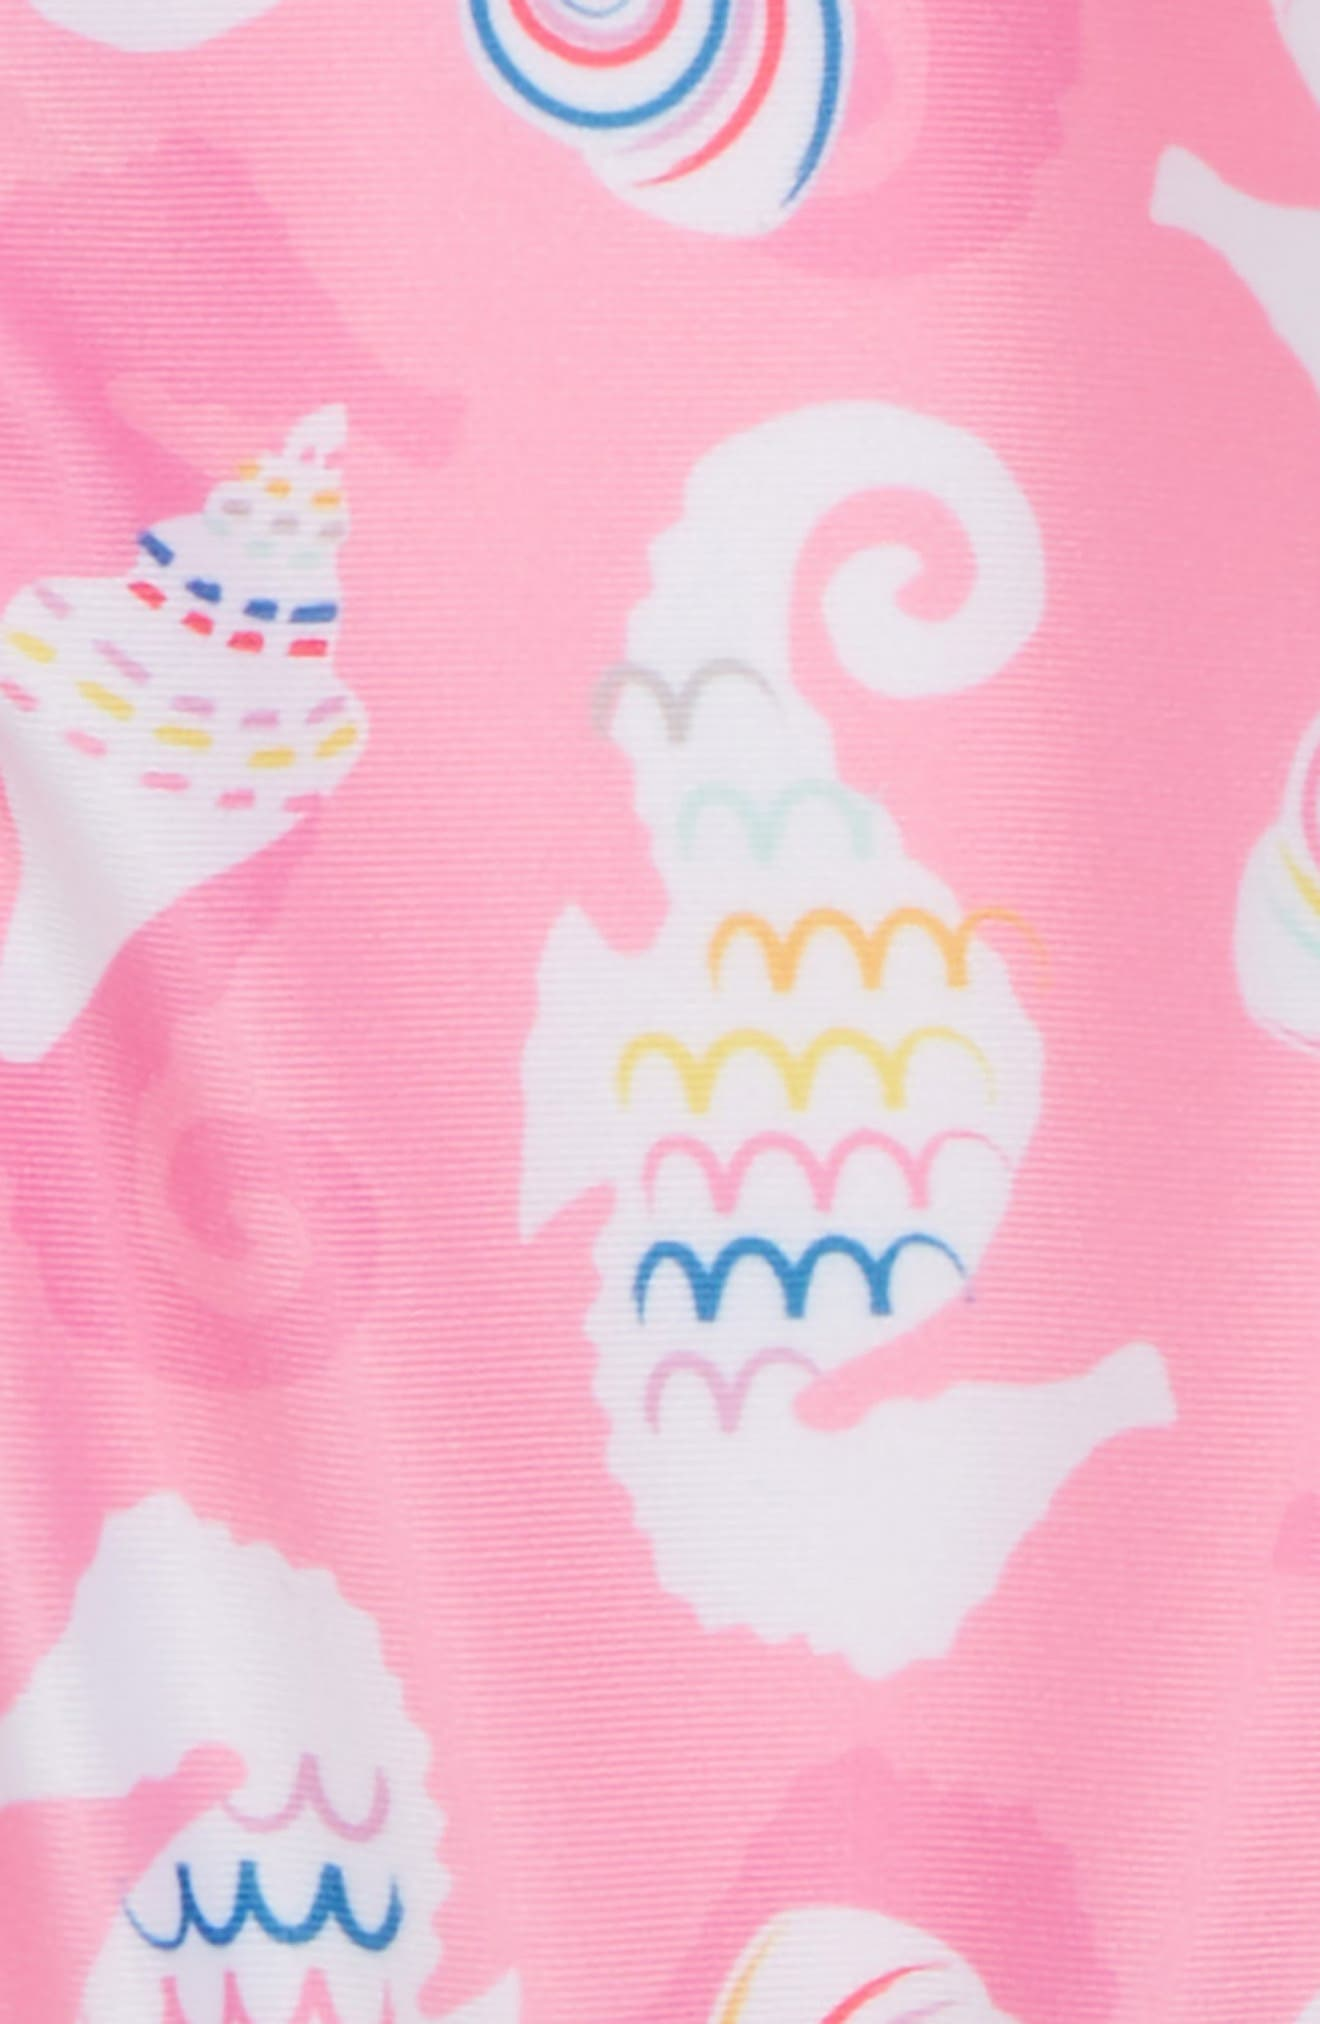 Seahorse/Shells One-Piece Short Sleeve Rashguard Swimsuit,                             Alternate thumbnail 2, color,                             650